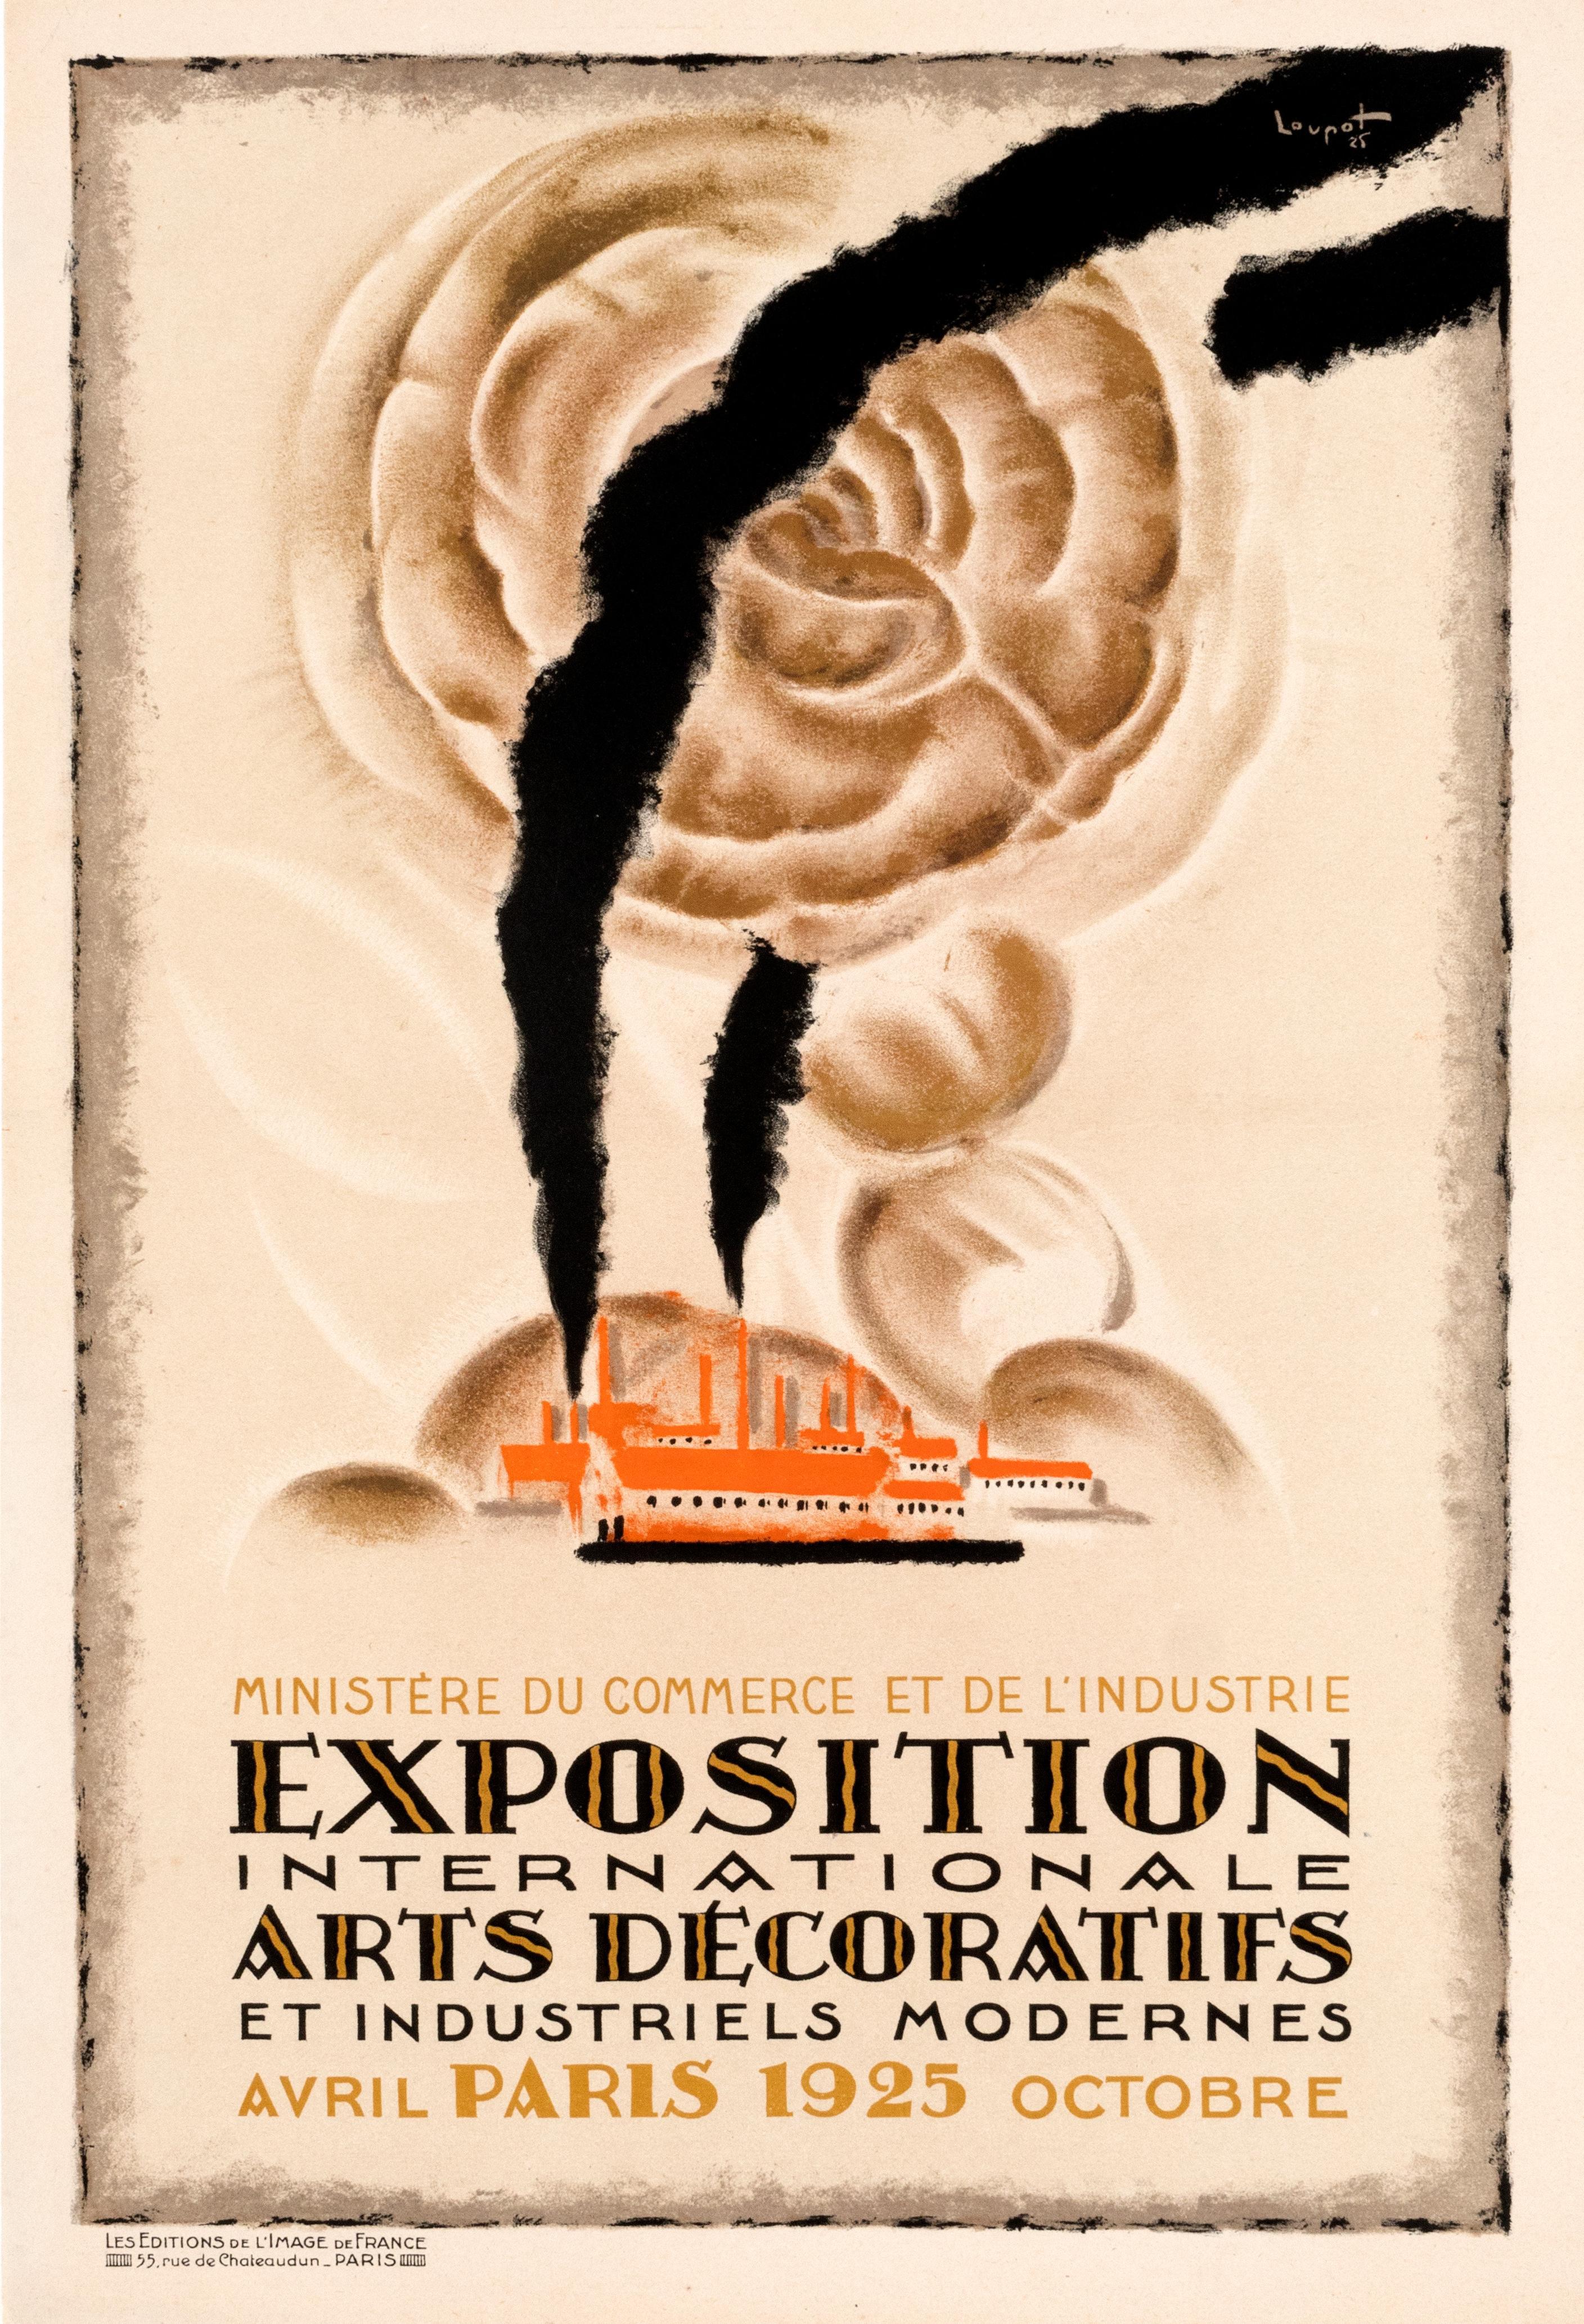 """Exposition Internationale Arts Decoratifs"" Original Vintage Exhibition Poster"